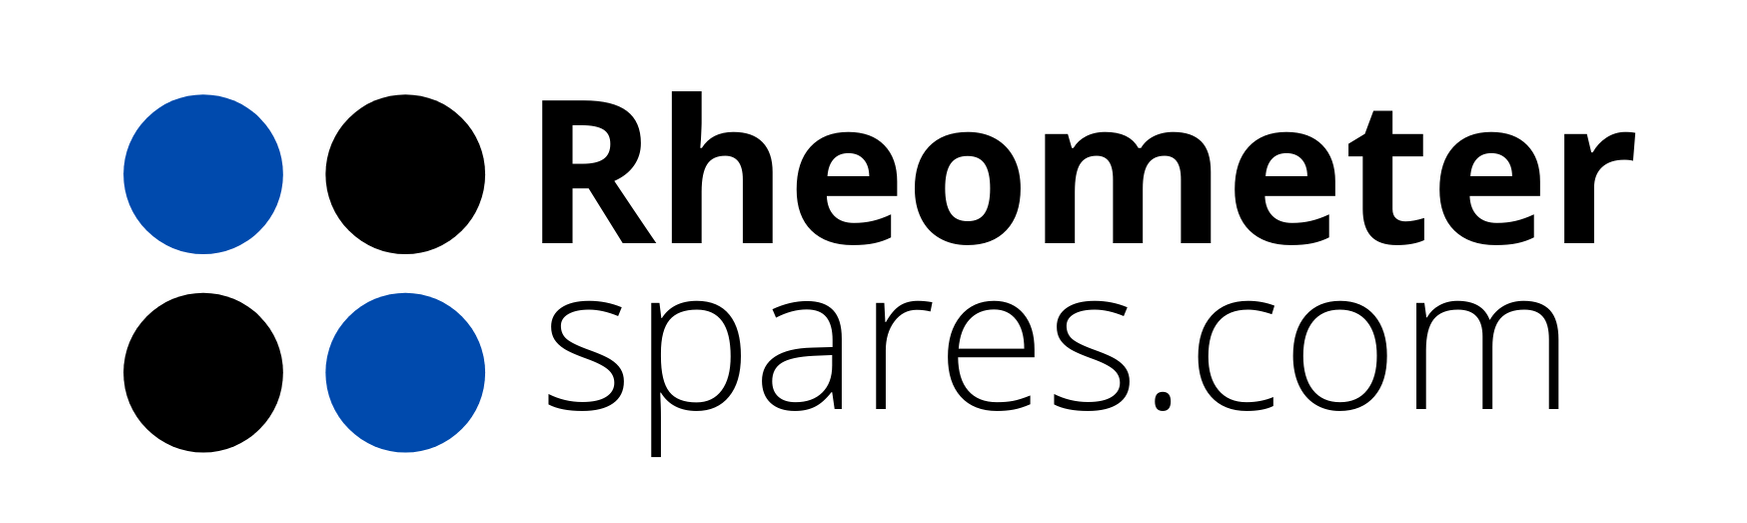 Rheometer Spares